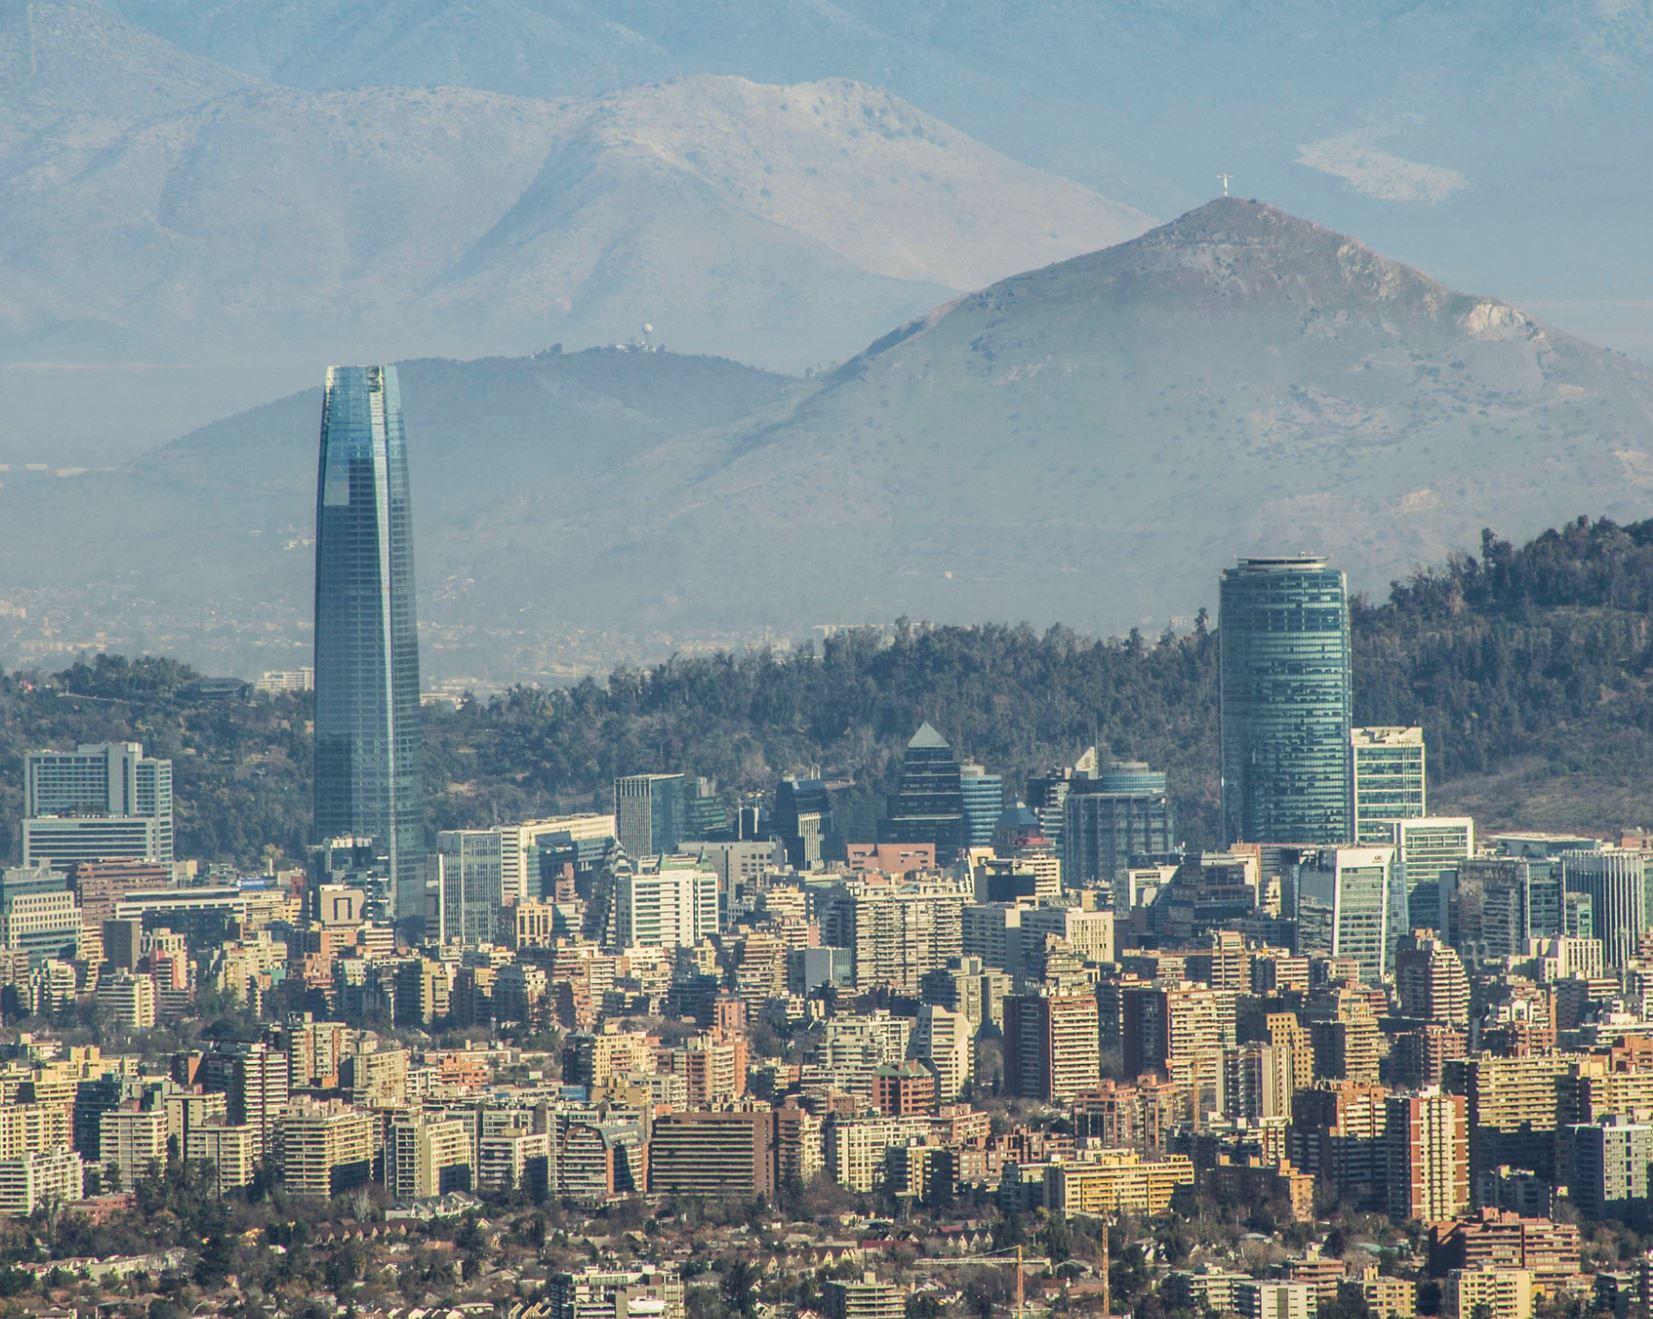 TEFL destinations in South America